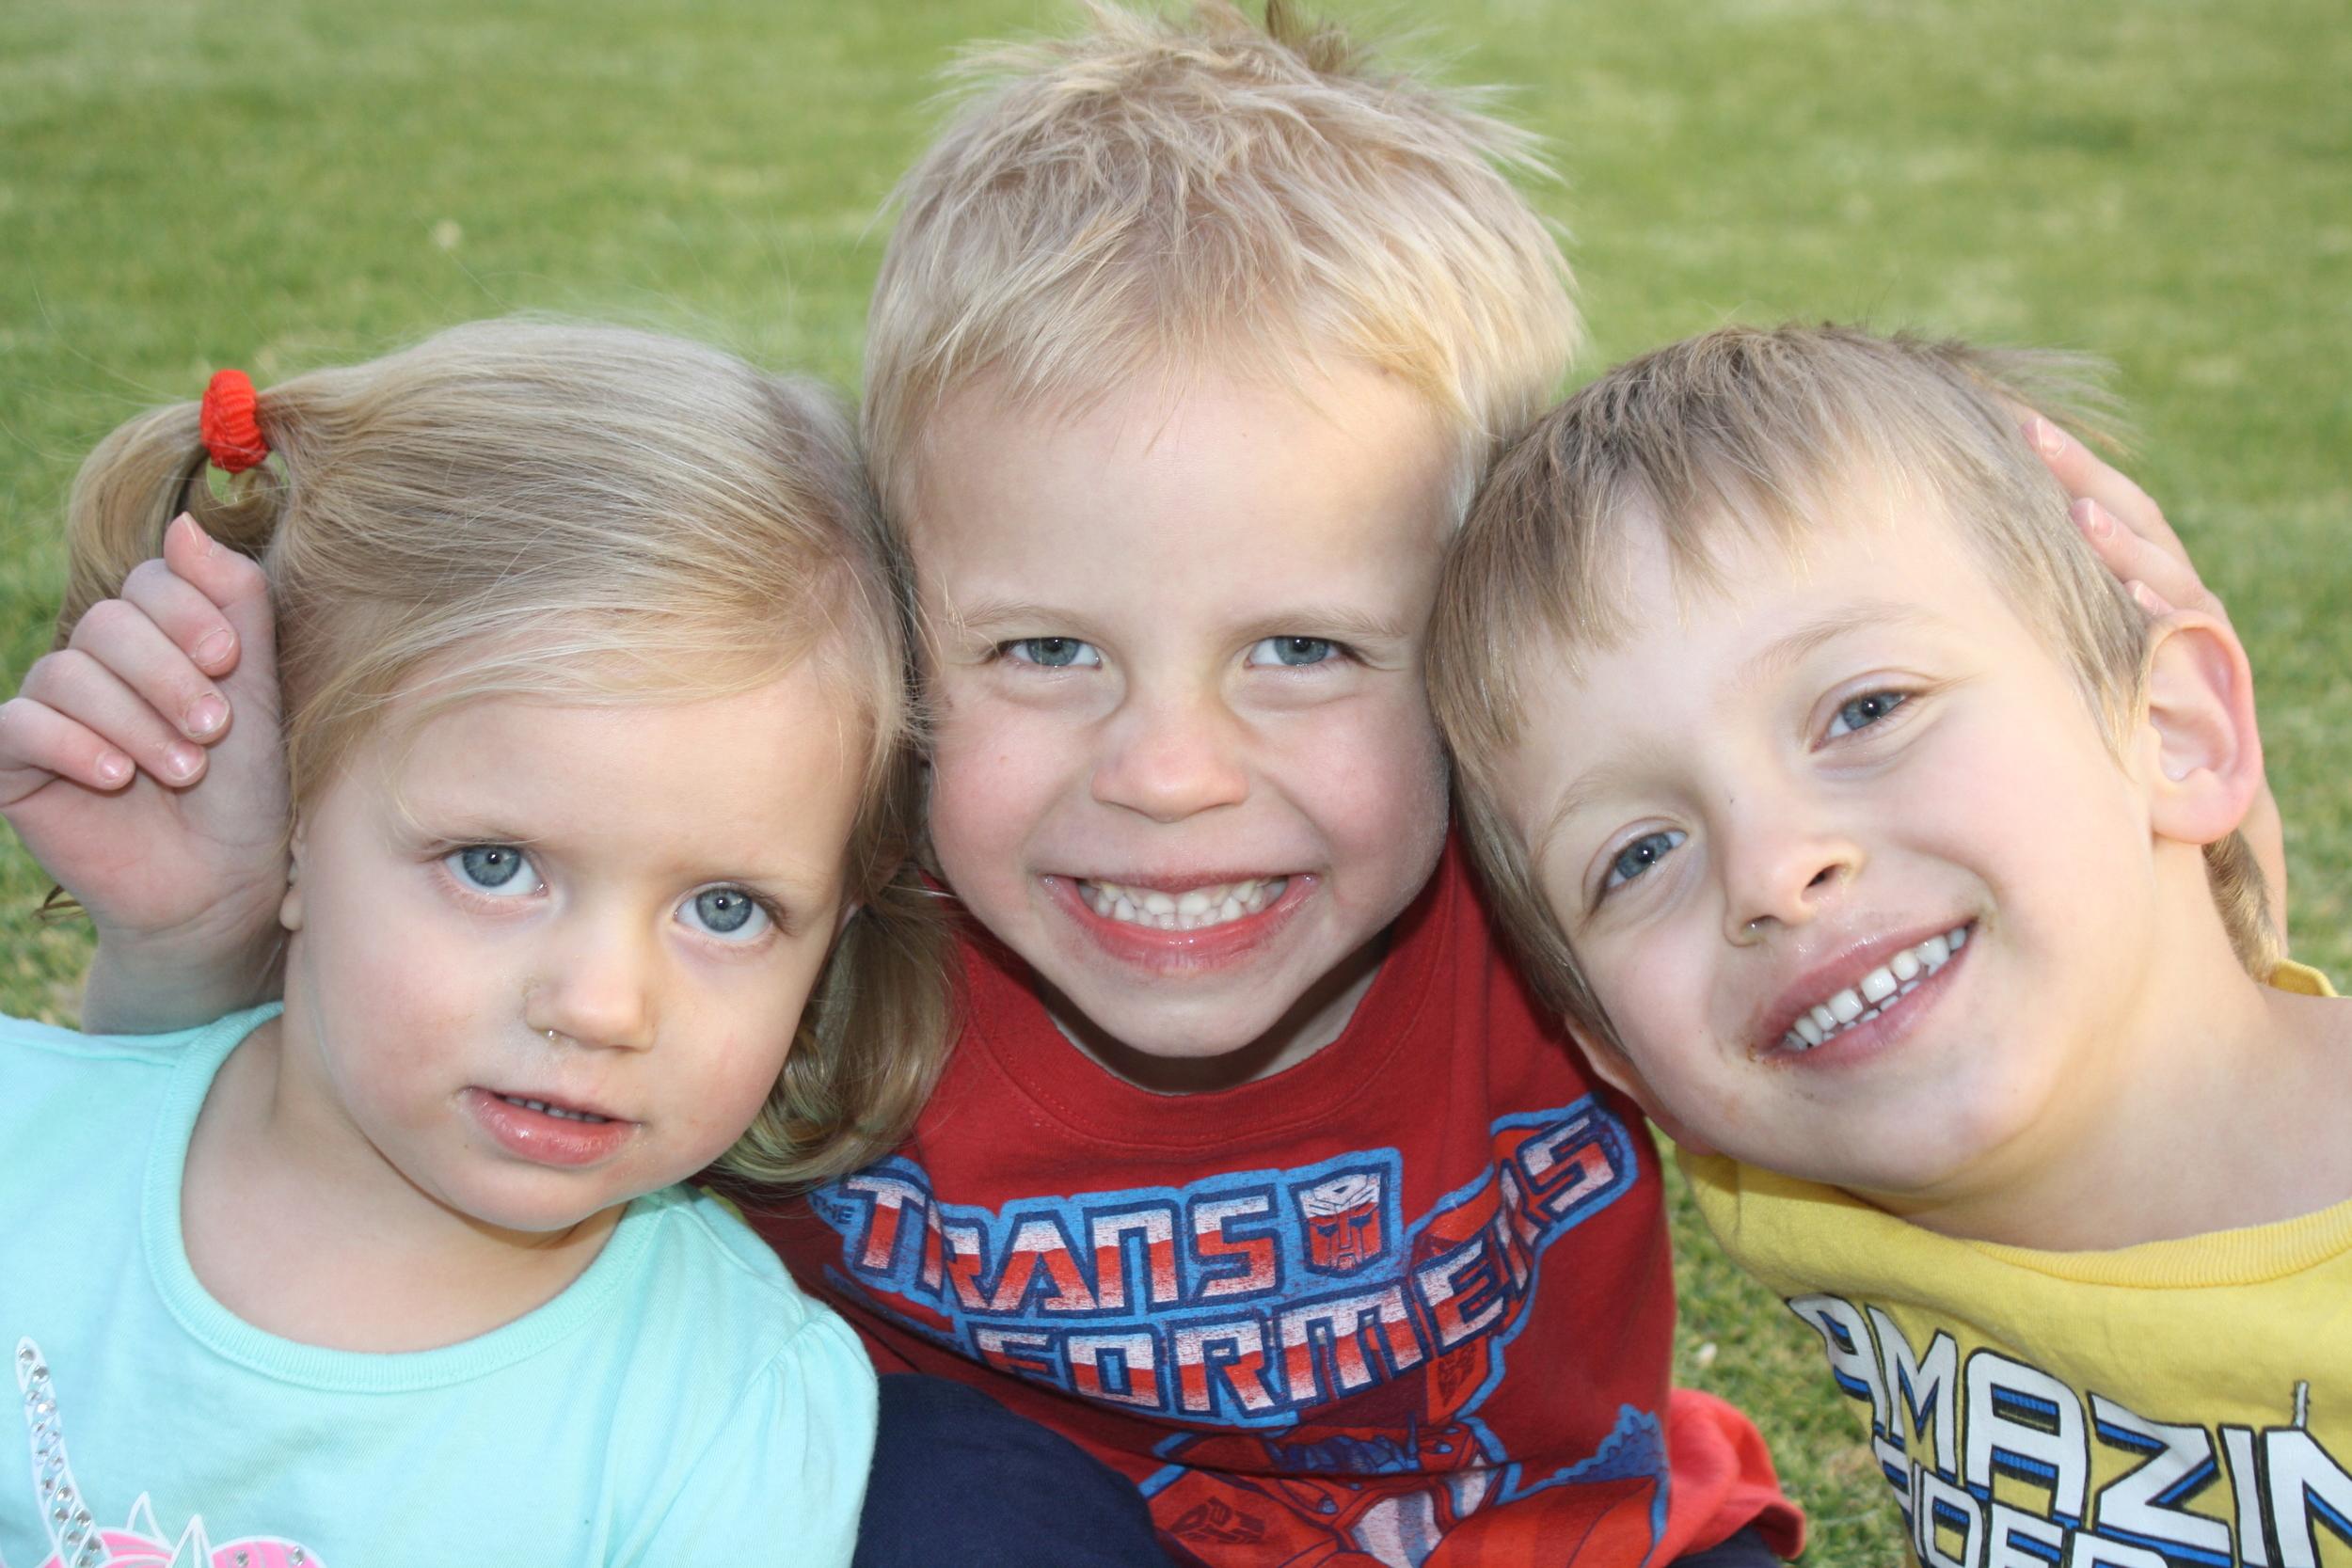 From the left: Maya Morgan (2), Evan Froud (5), Lorenzo Morgan (4)